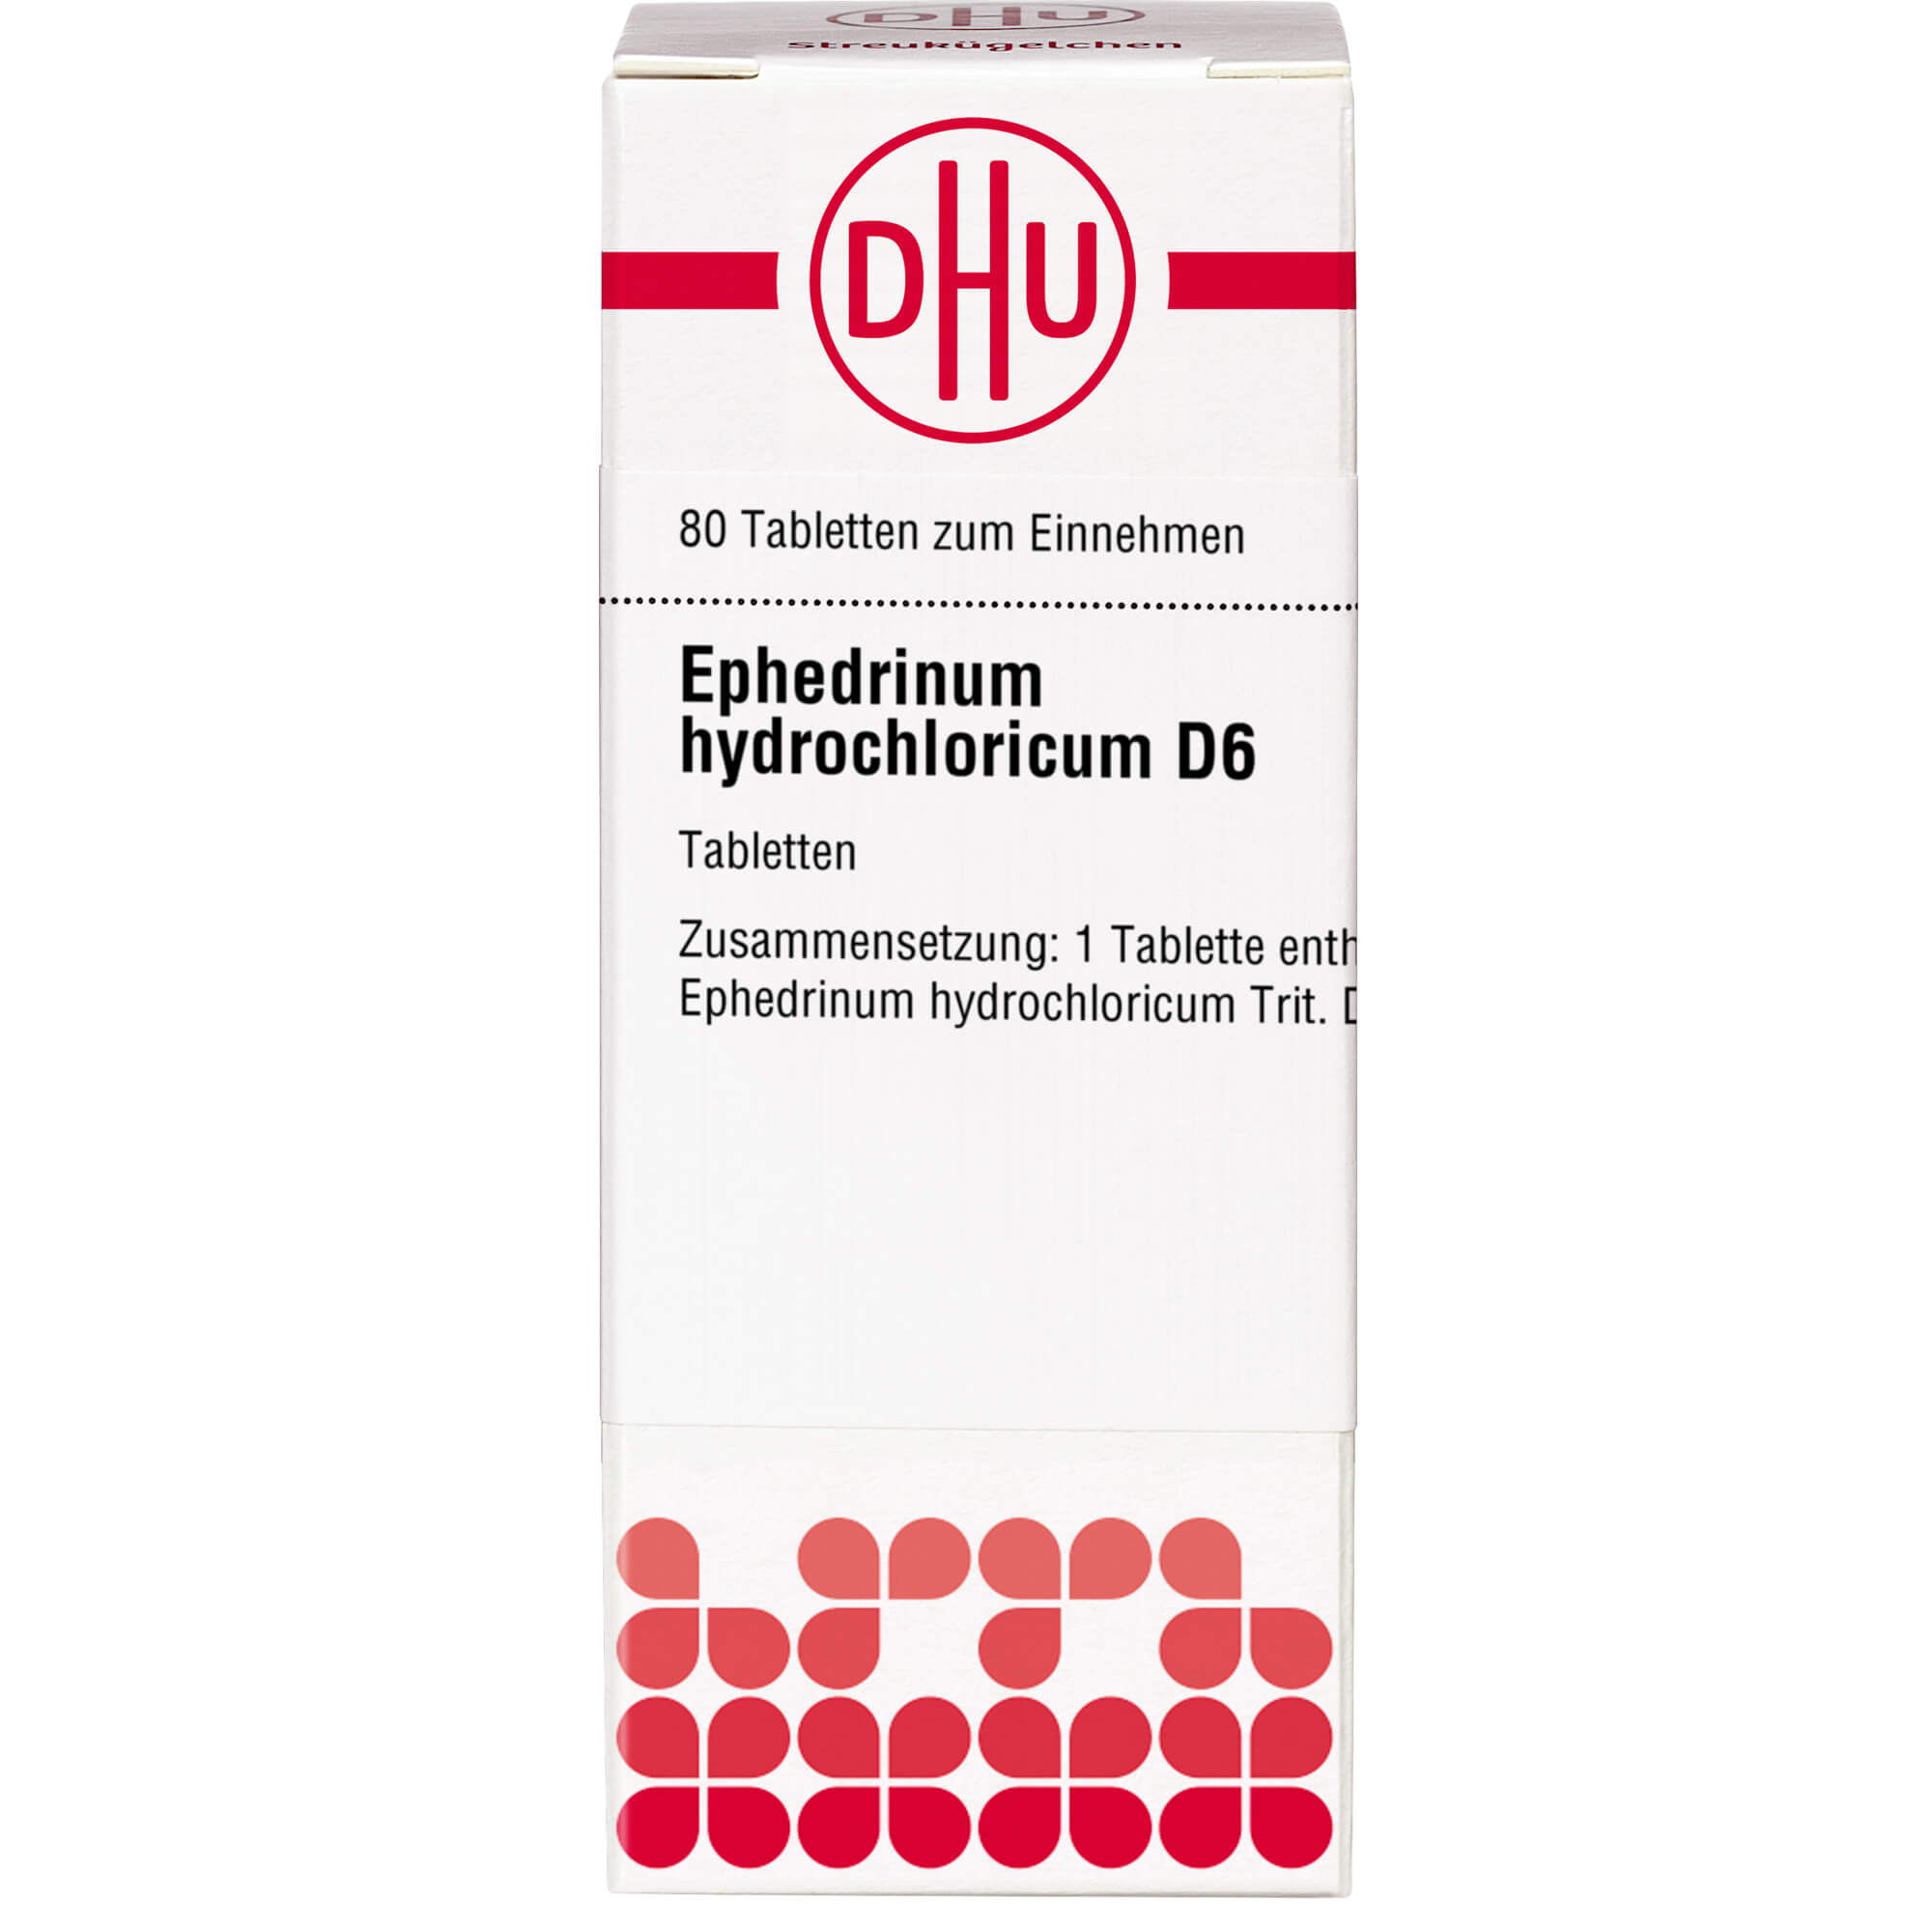 EPHEDRINUM hydrochloricum D 6 Tabletten